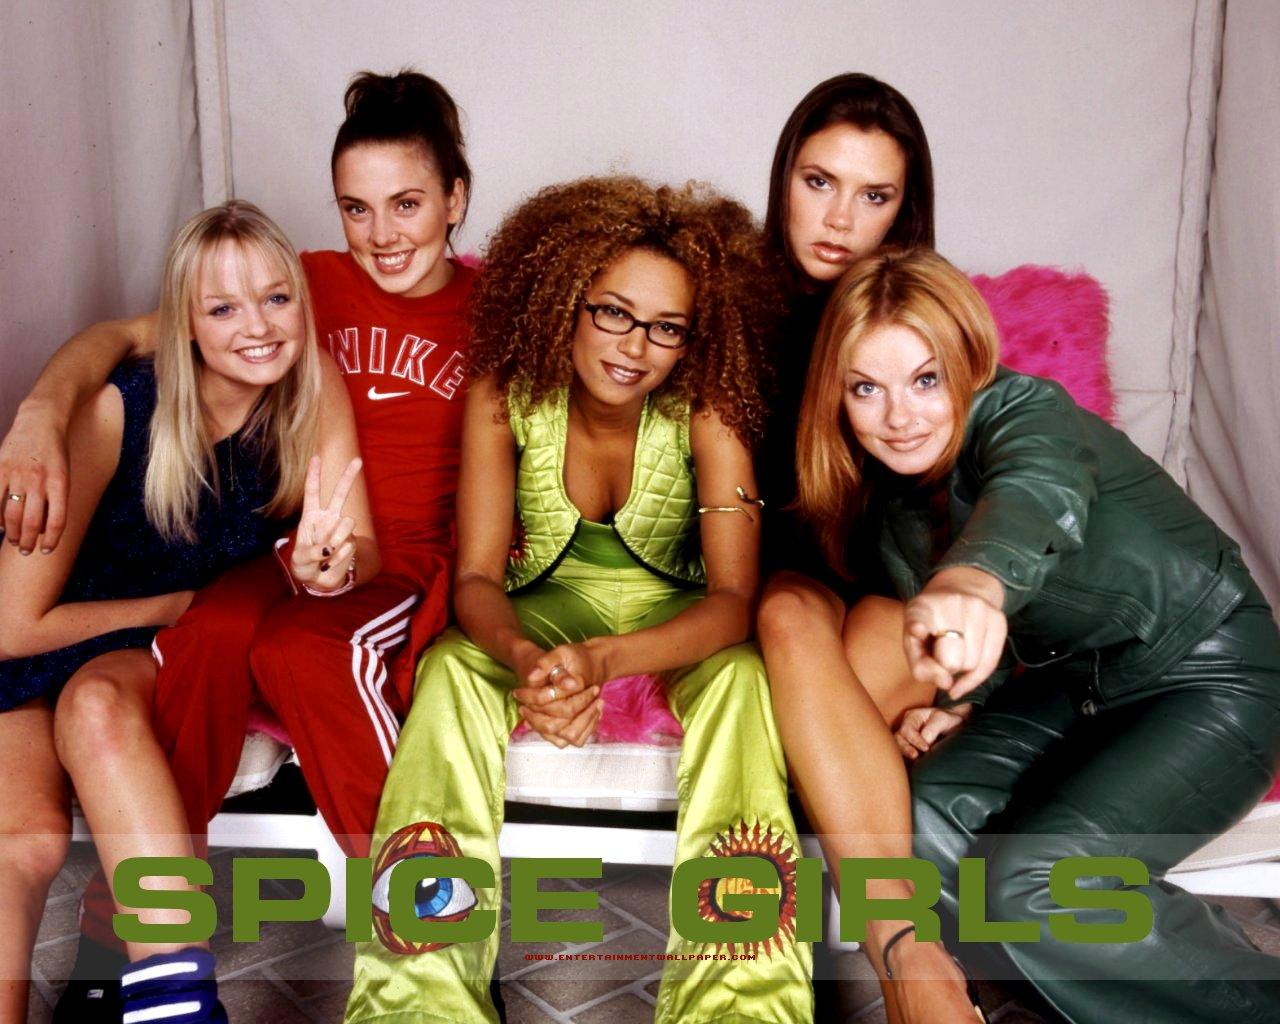 spice girls - photo #34